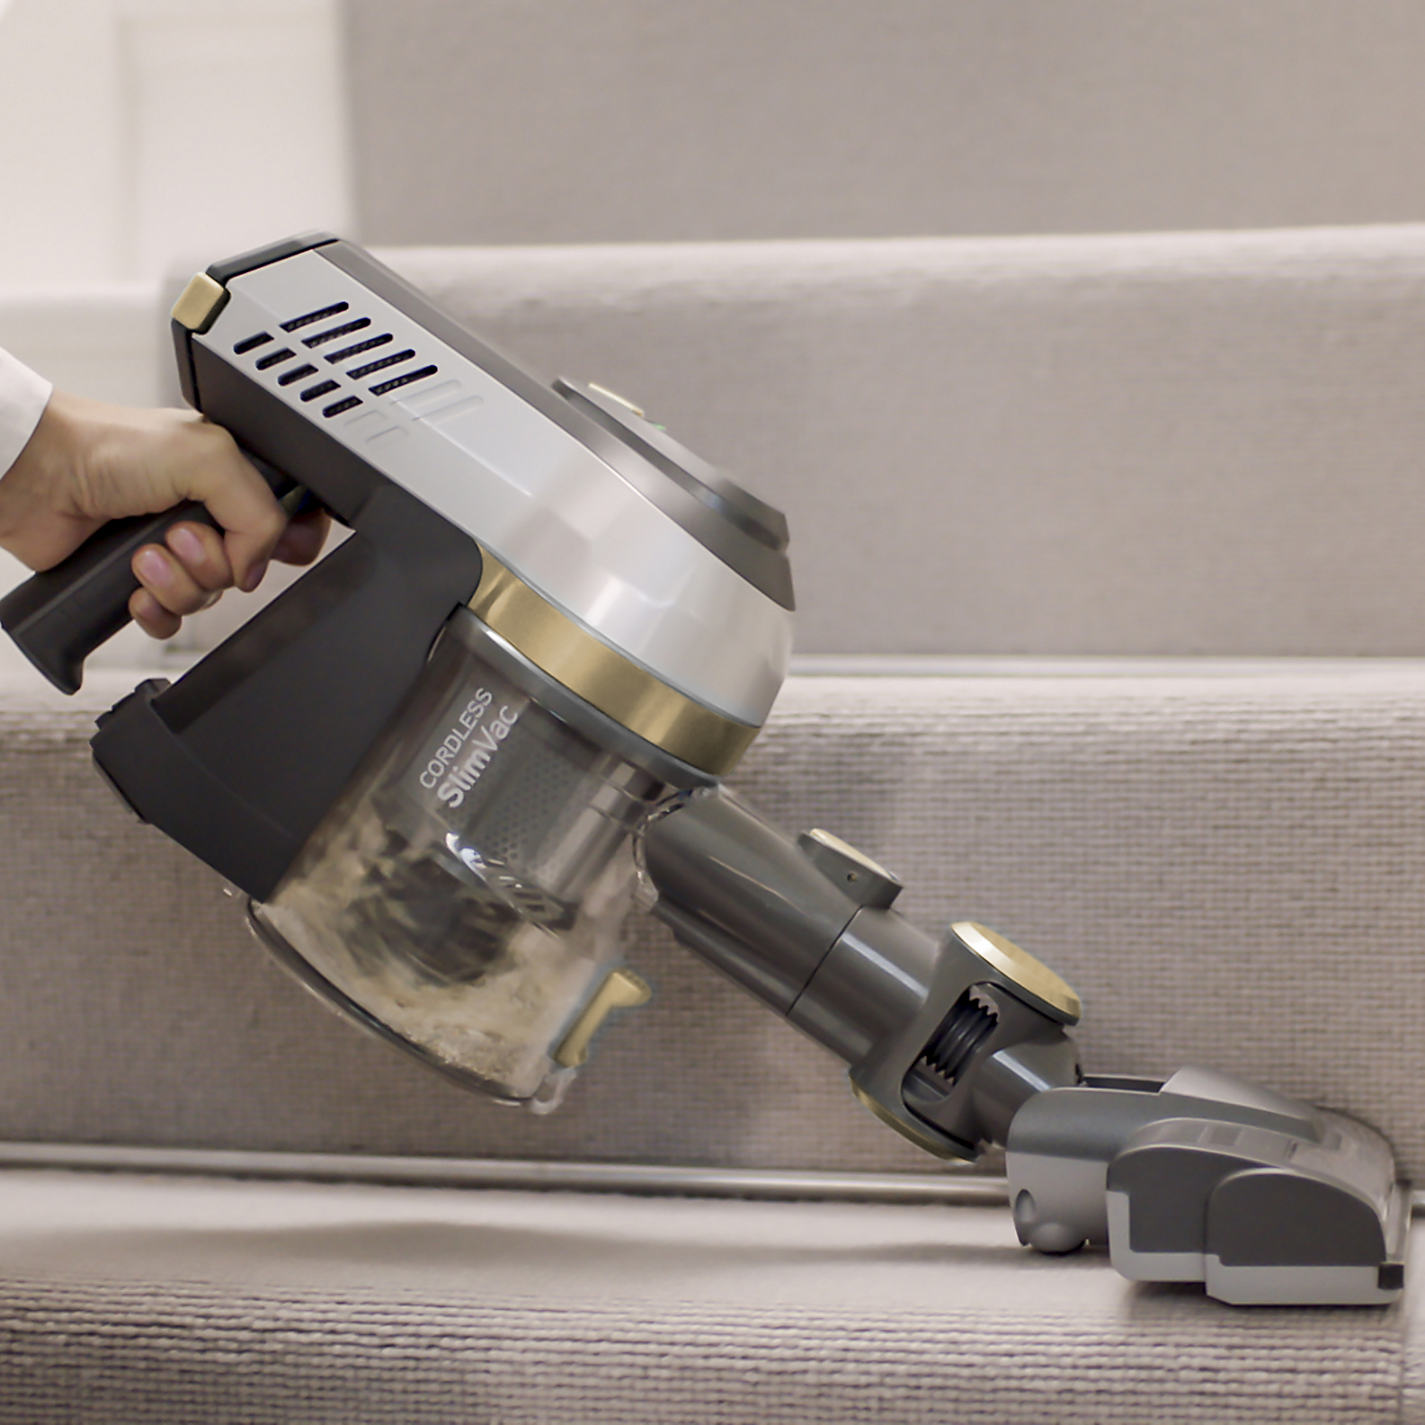 buy vax tbttv1 total home slim cordless vacuum cleaner silver online at - Cordless Vacuum Cleaner